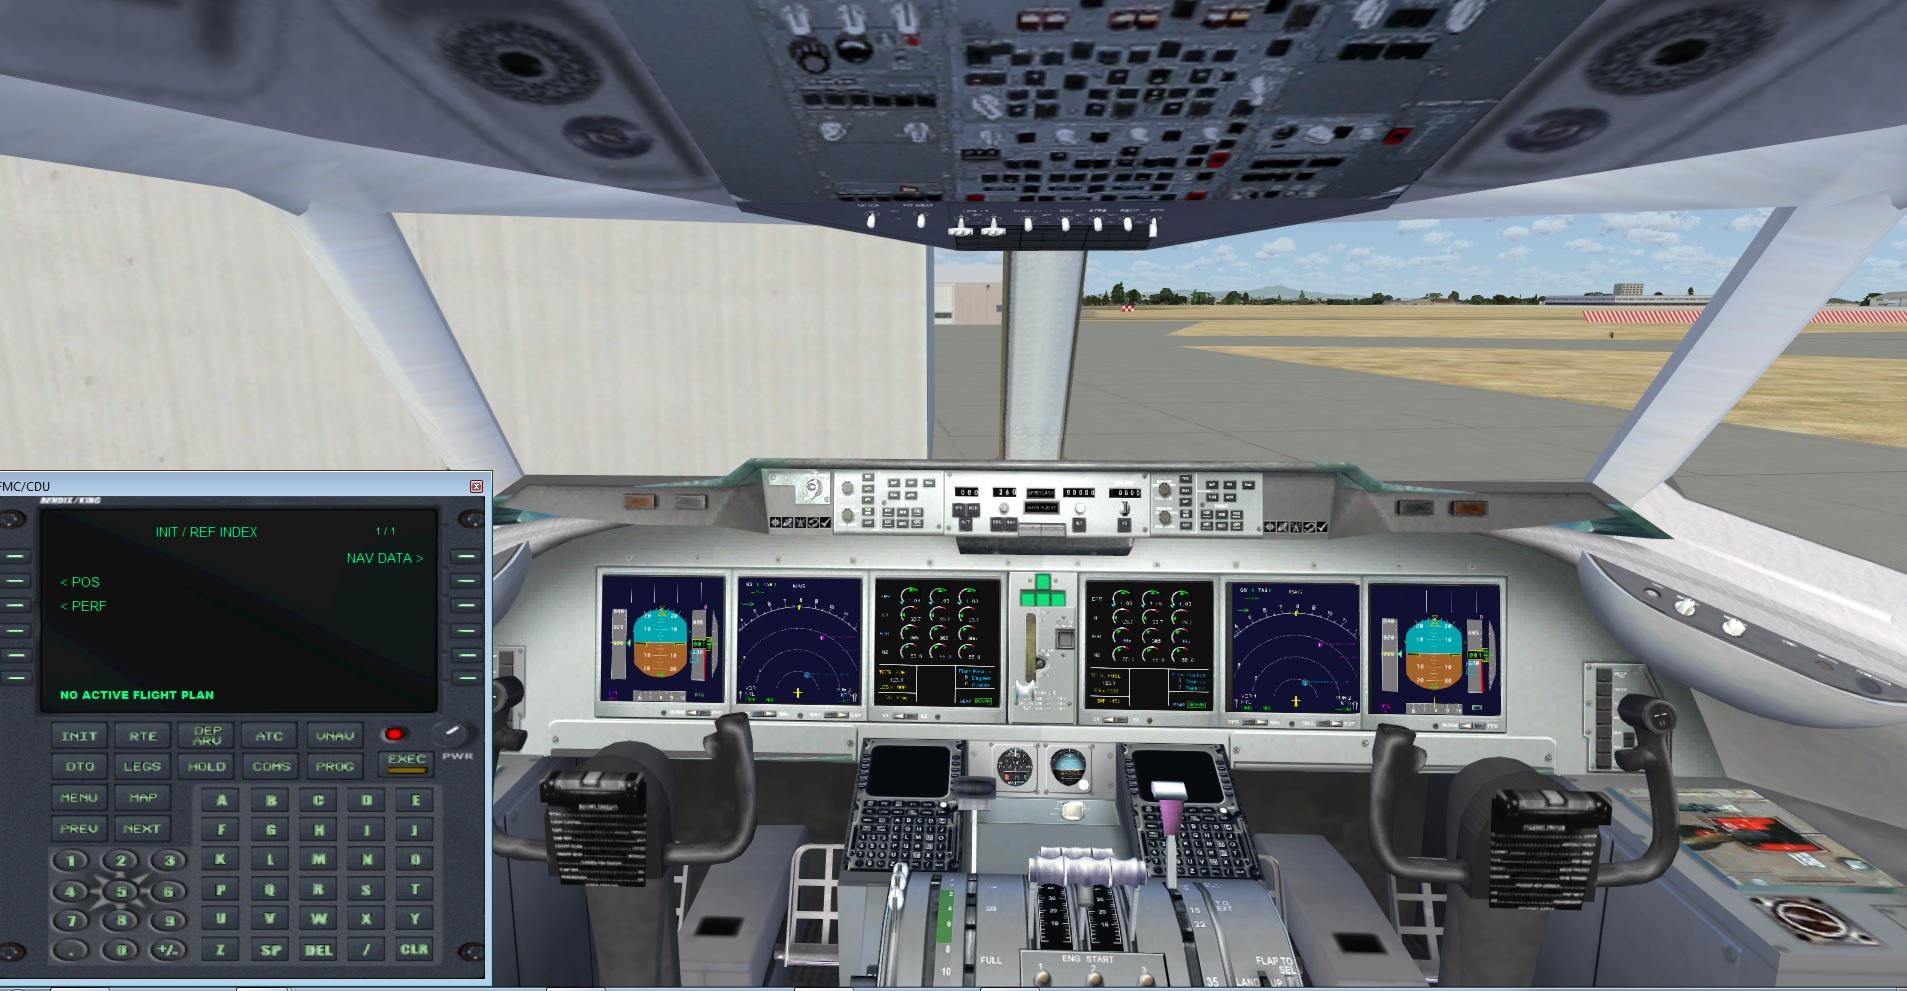 fs-freeware net - FSX Boeing 737-700 Southwest Airlines